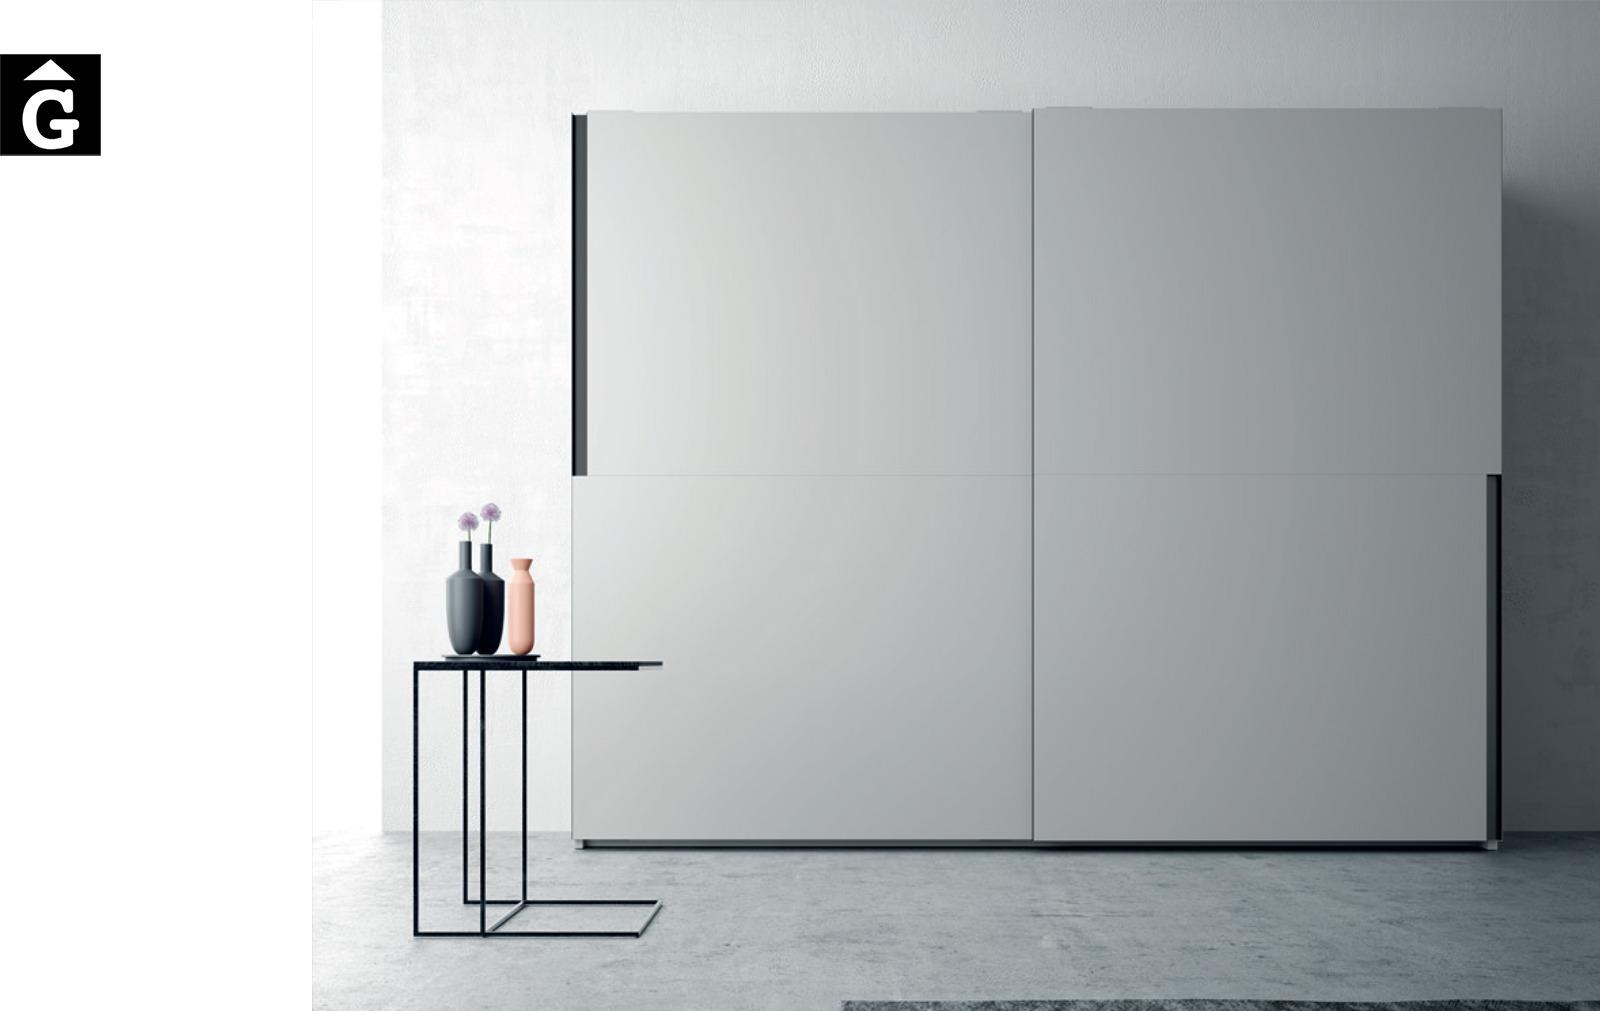 Armari portes Tecto correderes JJP NoLimits by Mobles GIFREU Girona Armaris a mida modern minim elegant atemporal